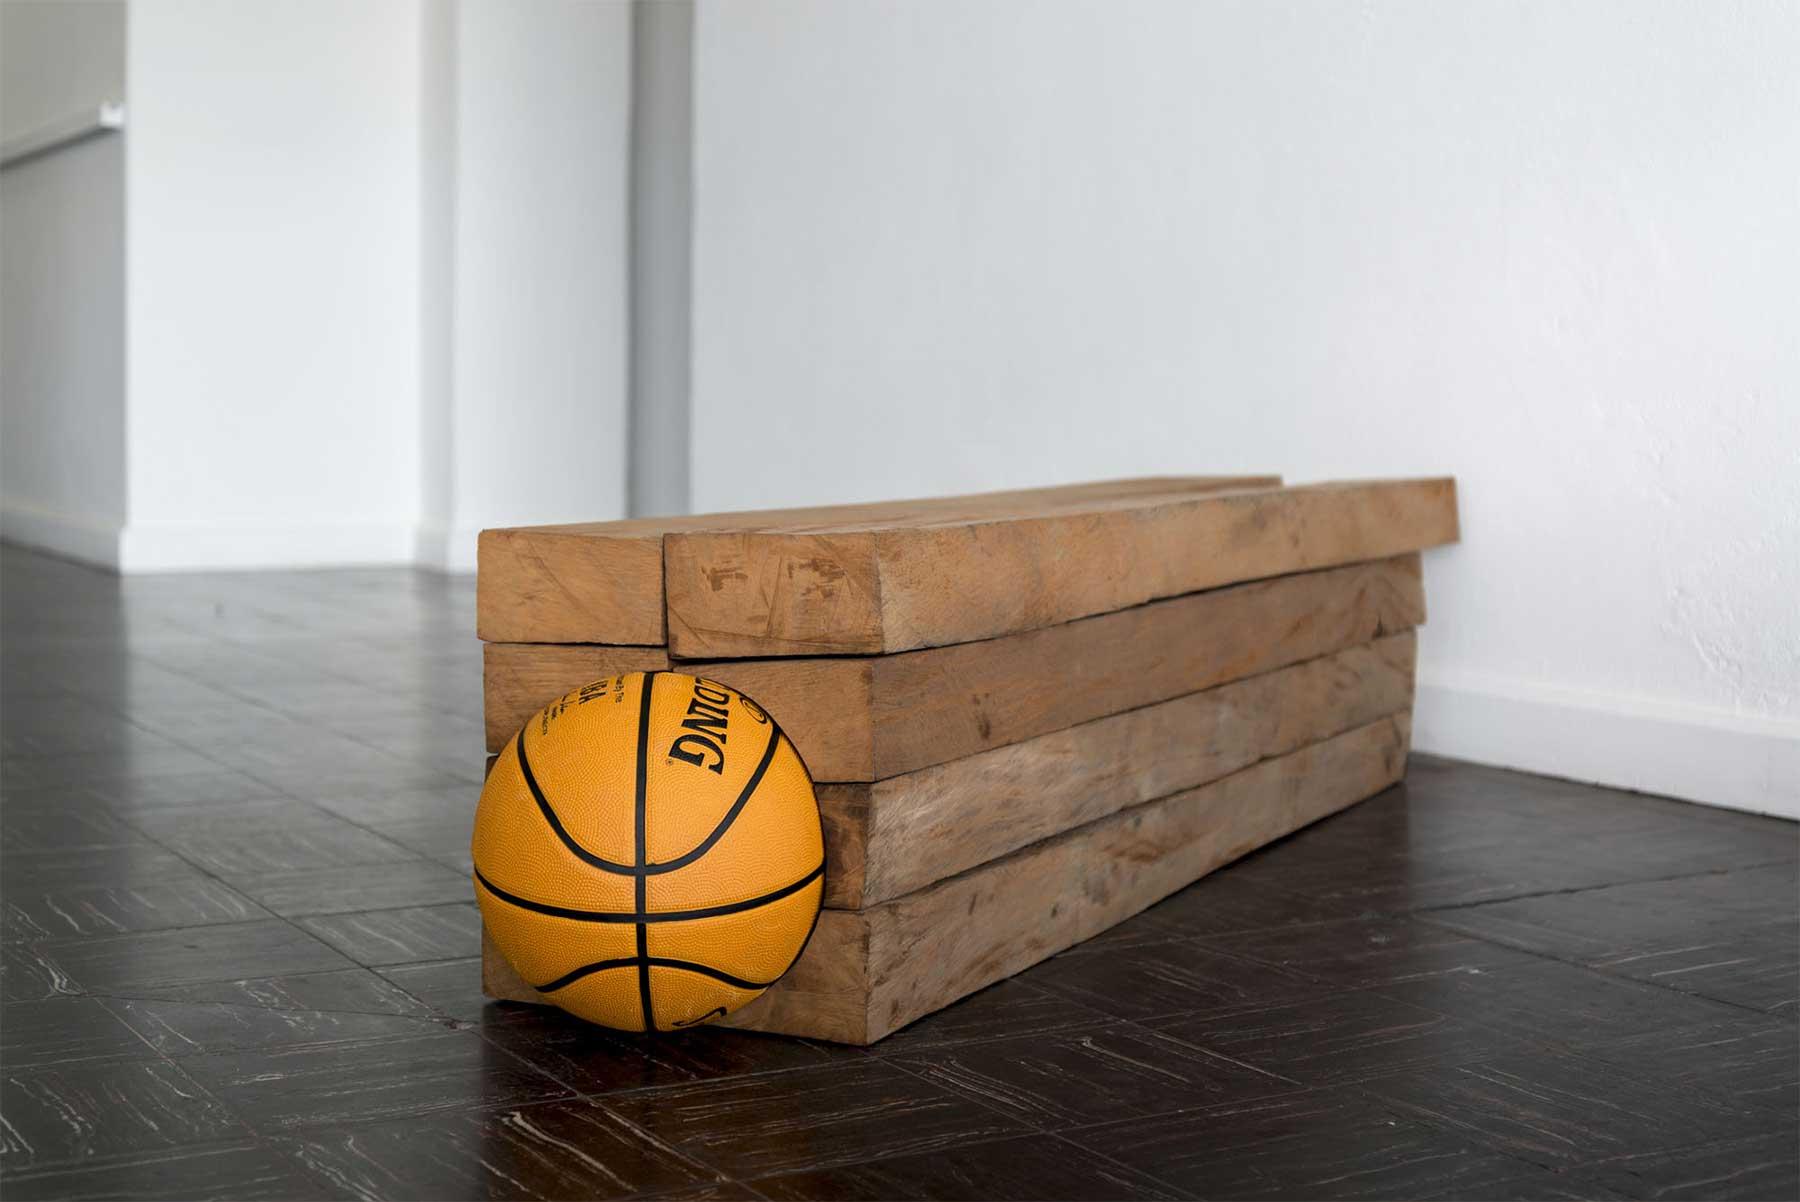 Sportliche Skulpturen von Darío Escobar Dario-Escobar_06